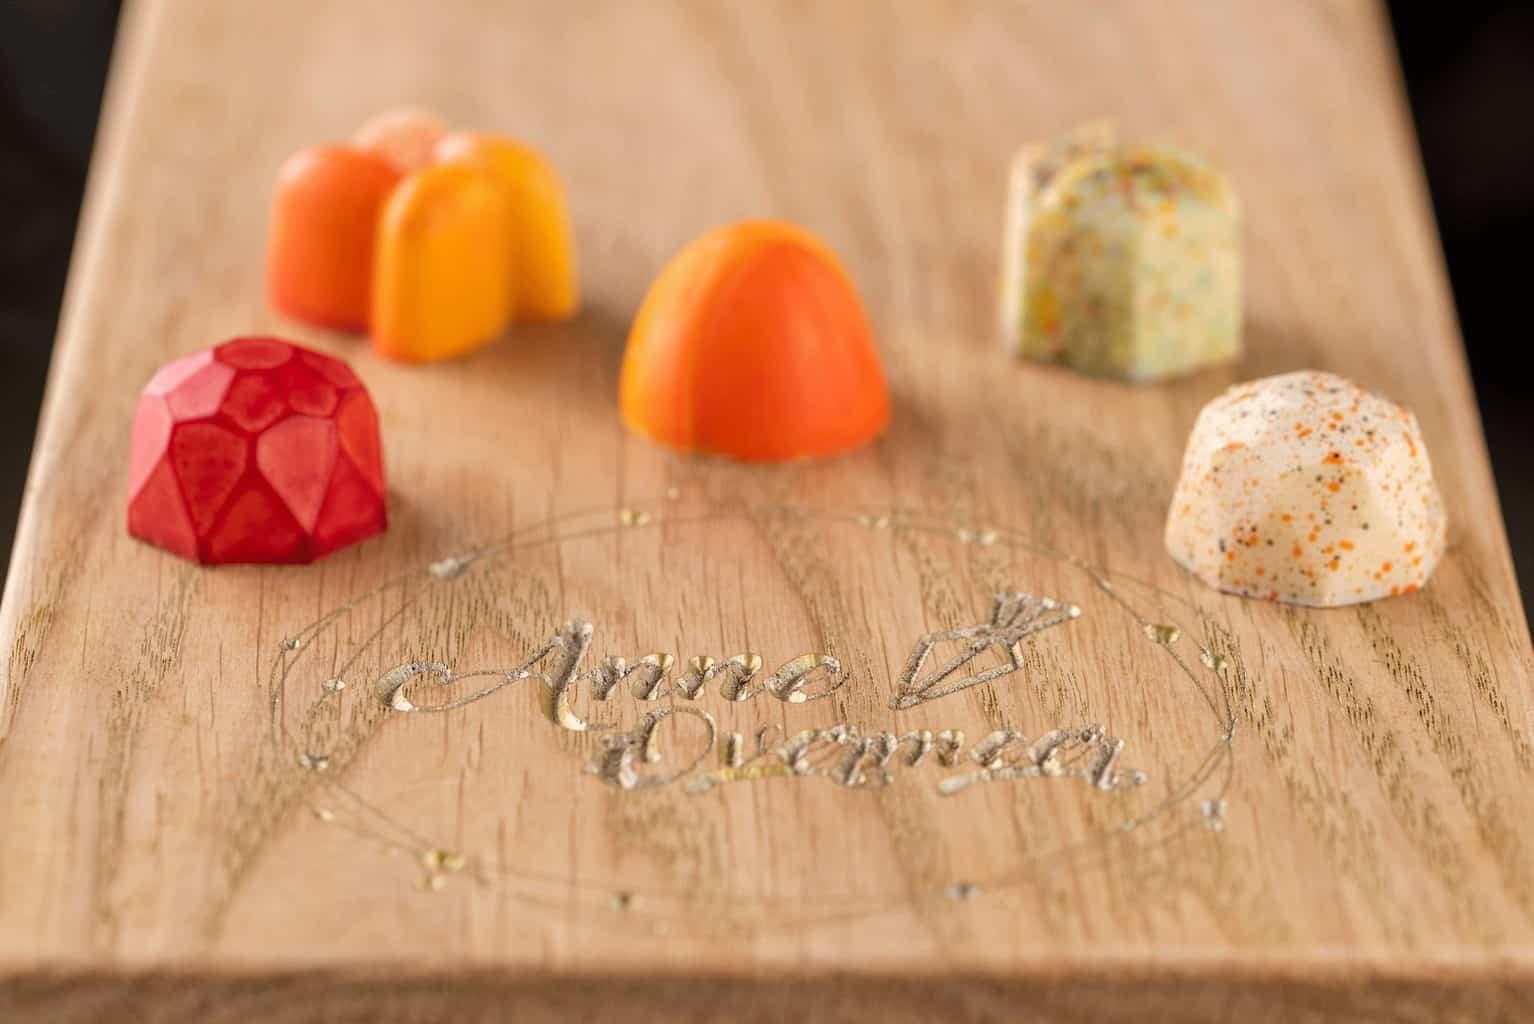 productfotografie sfeerfotografie chocolade witte chocolade anne overmeer oranje rood - Productfotografie van chocolade